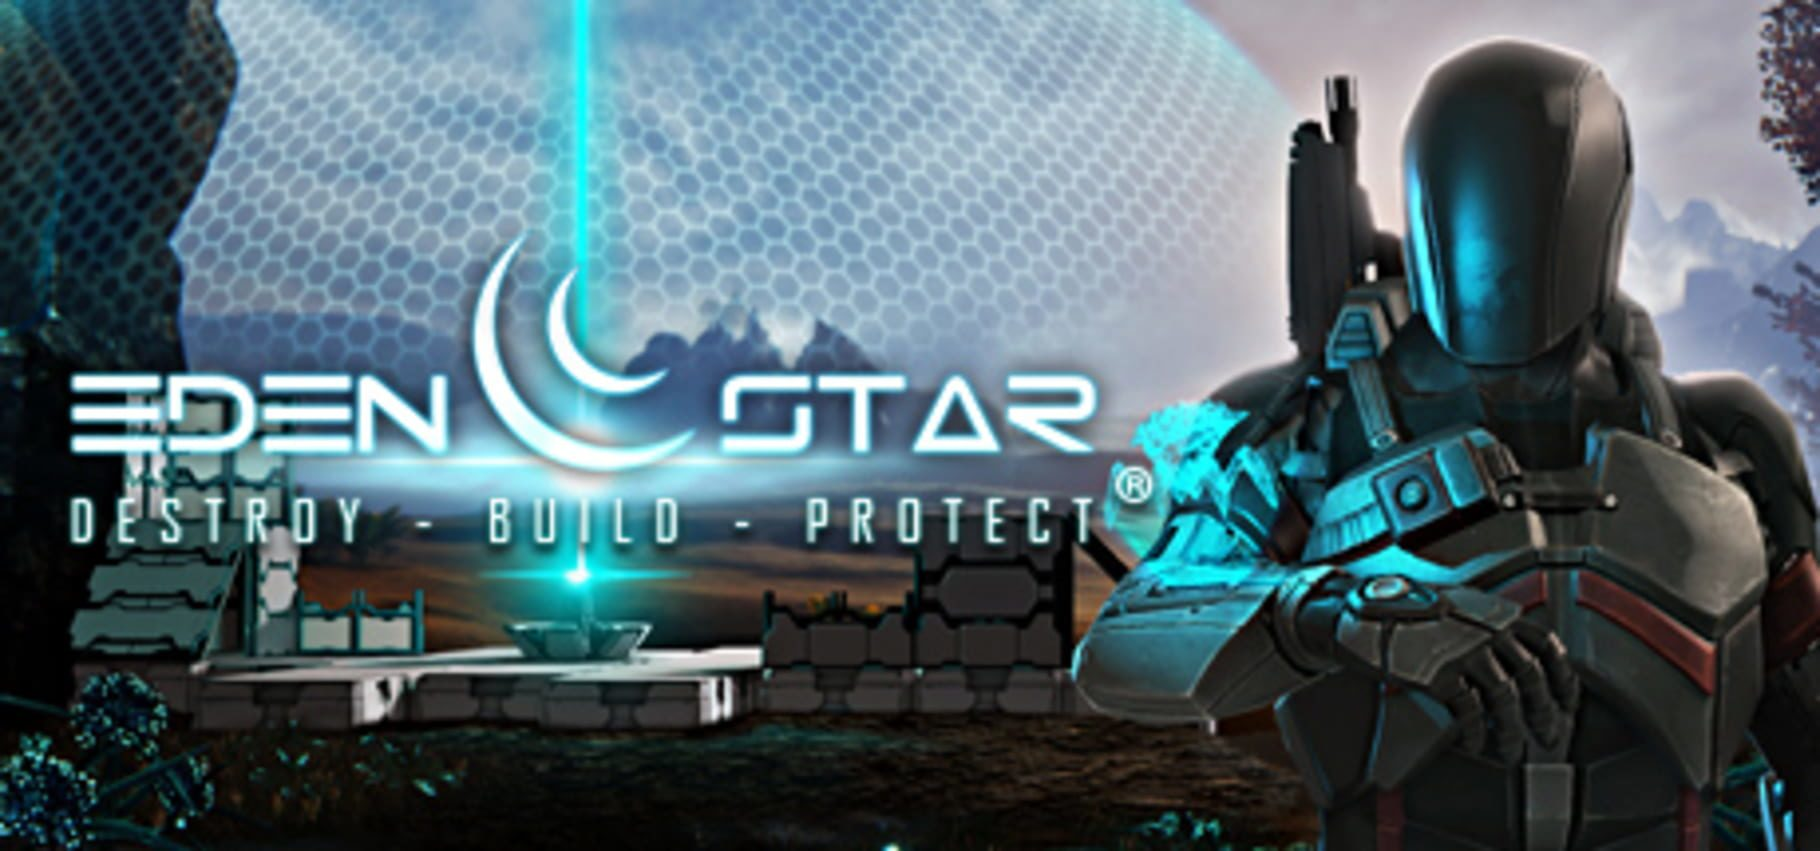 buy Eden Star cd key for all platform